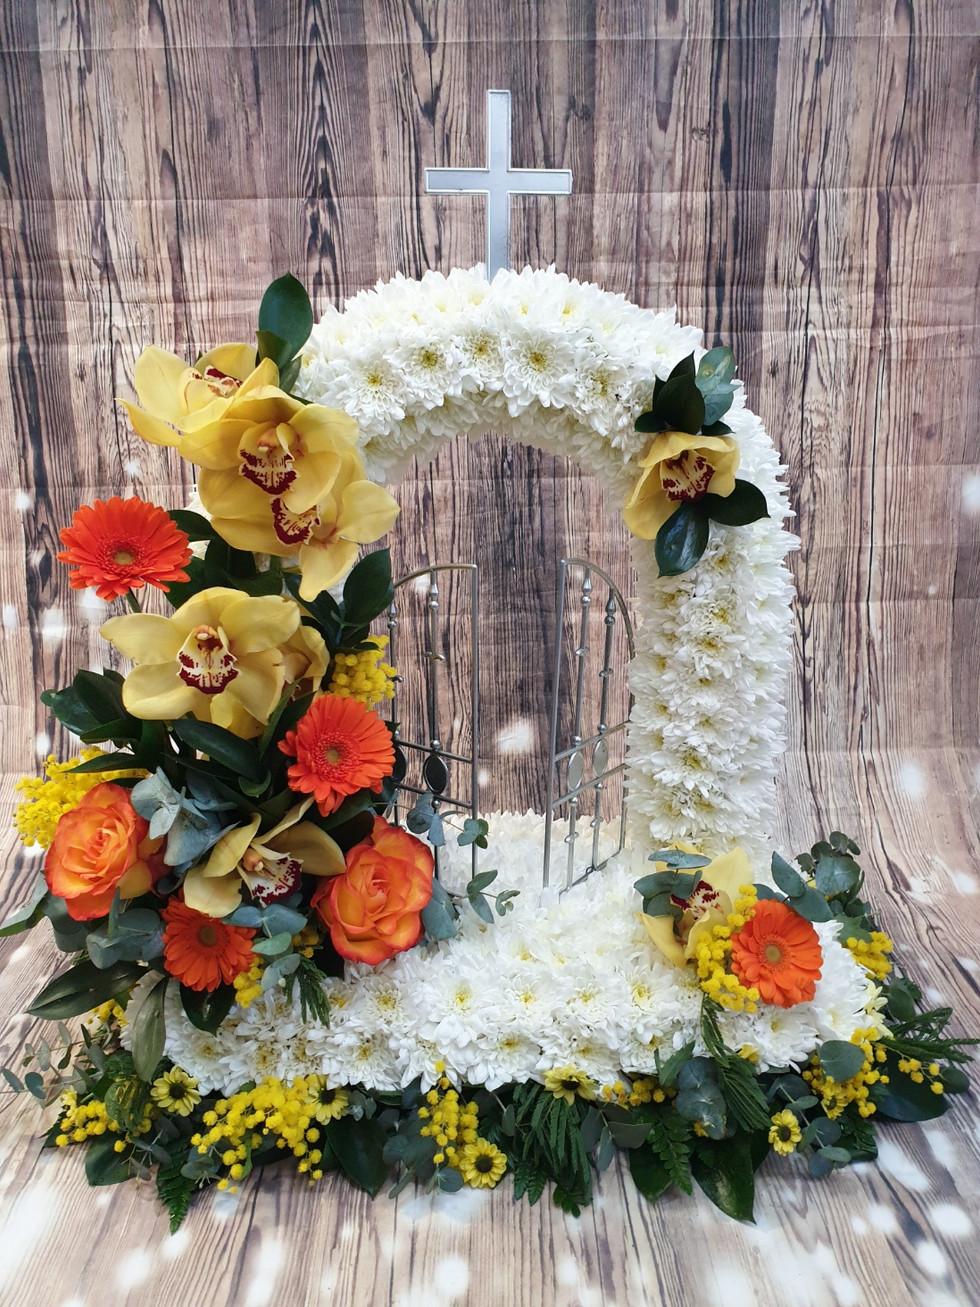 Bespoke Funeral Tribute 029